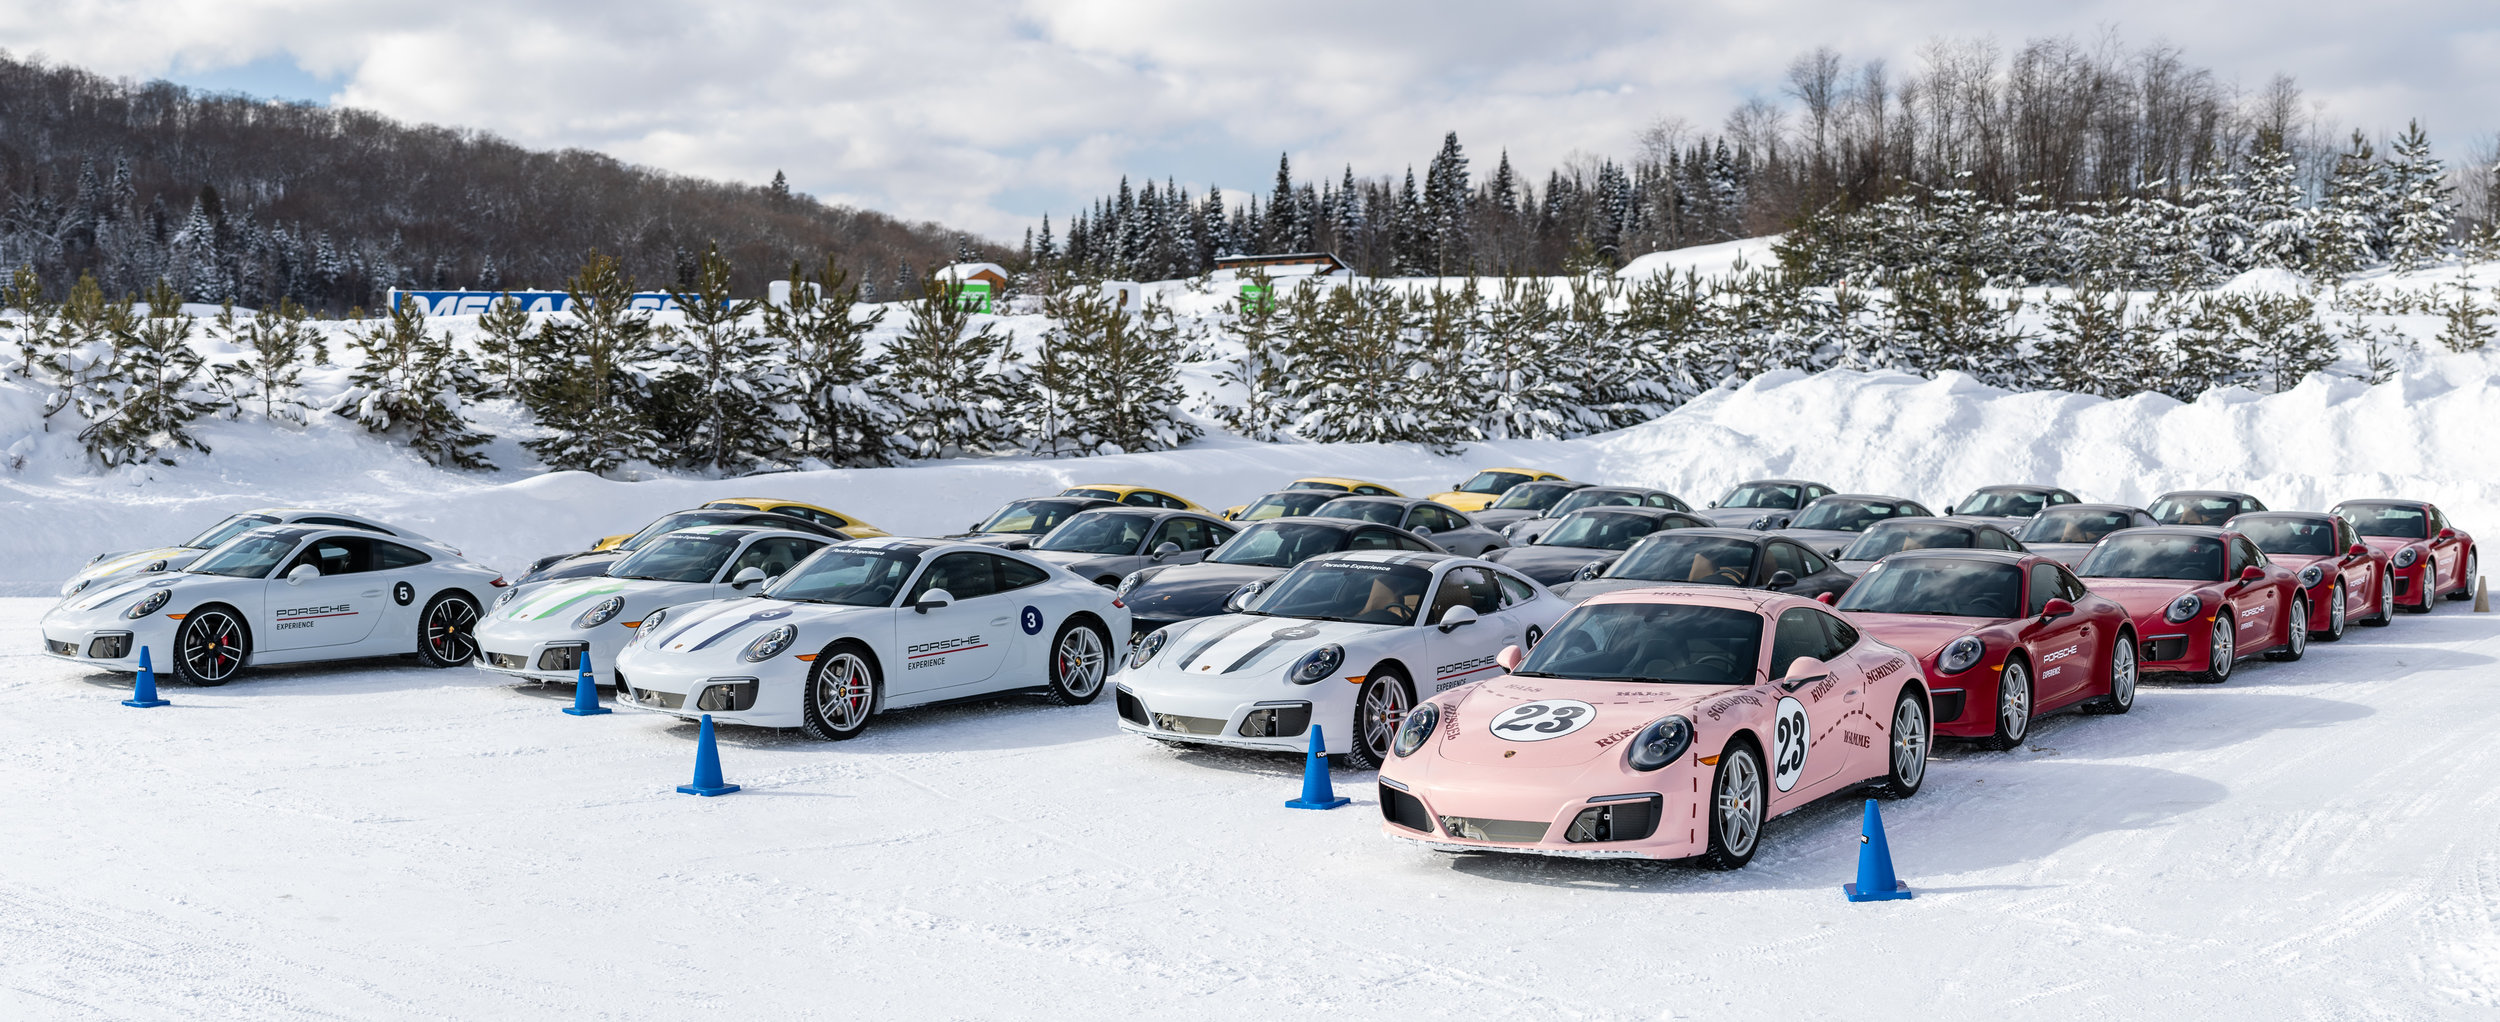 Porsche-Ice-Experience-Canada-Media-97.jpg